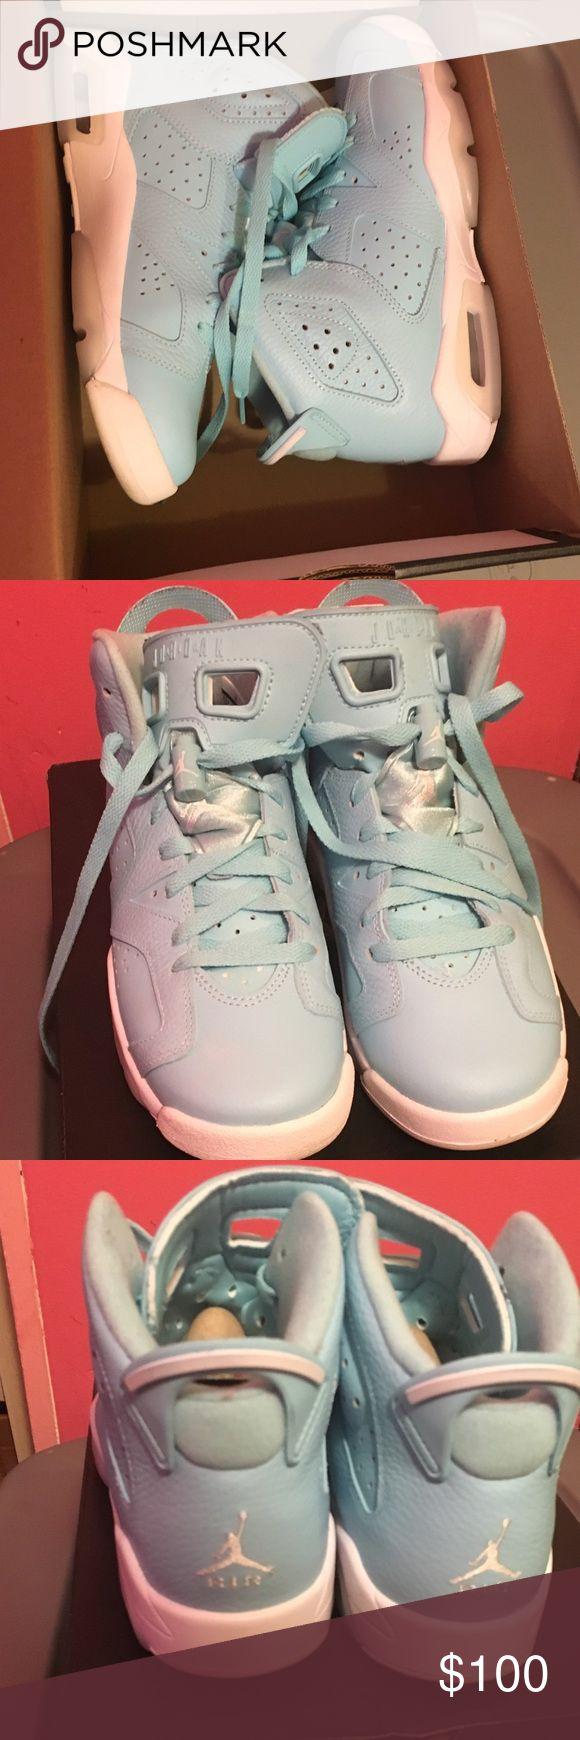 LIKE NEW Retro Jordan 6 Blue Sneakers LIKE NEW, worn ONCE for date night Retro Jordan 6 Blue Sneakers Air Jordan Shoes Sneakers